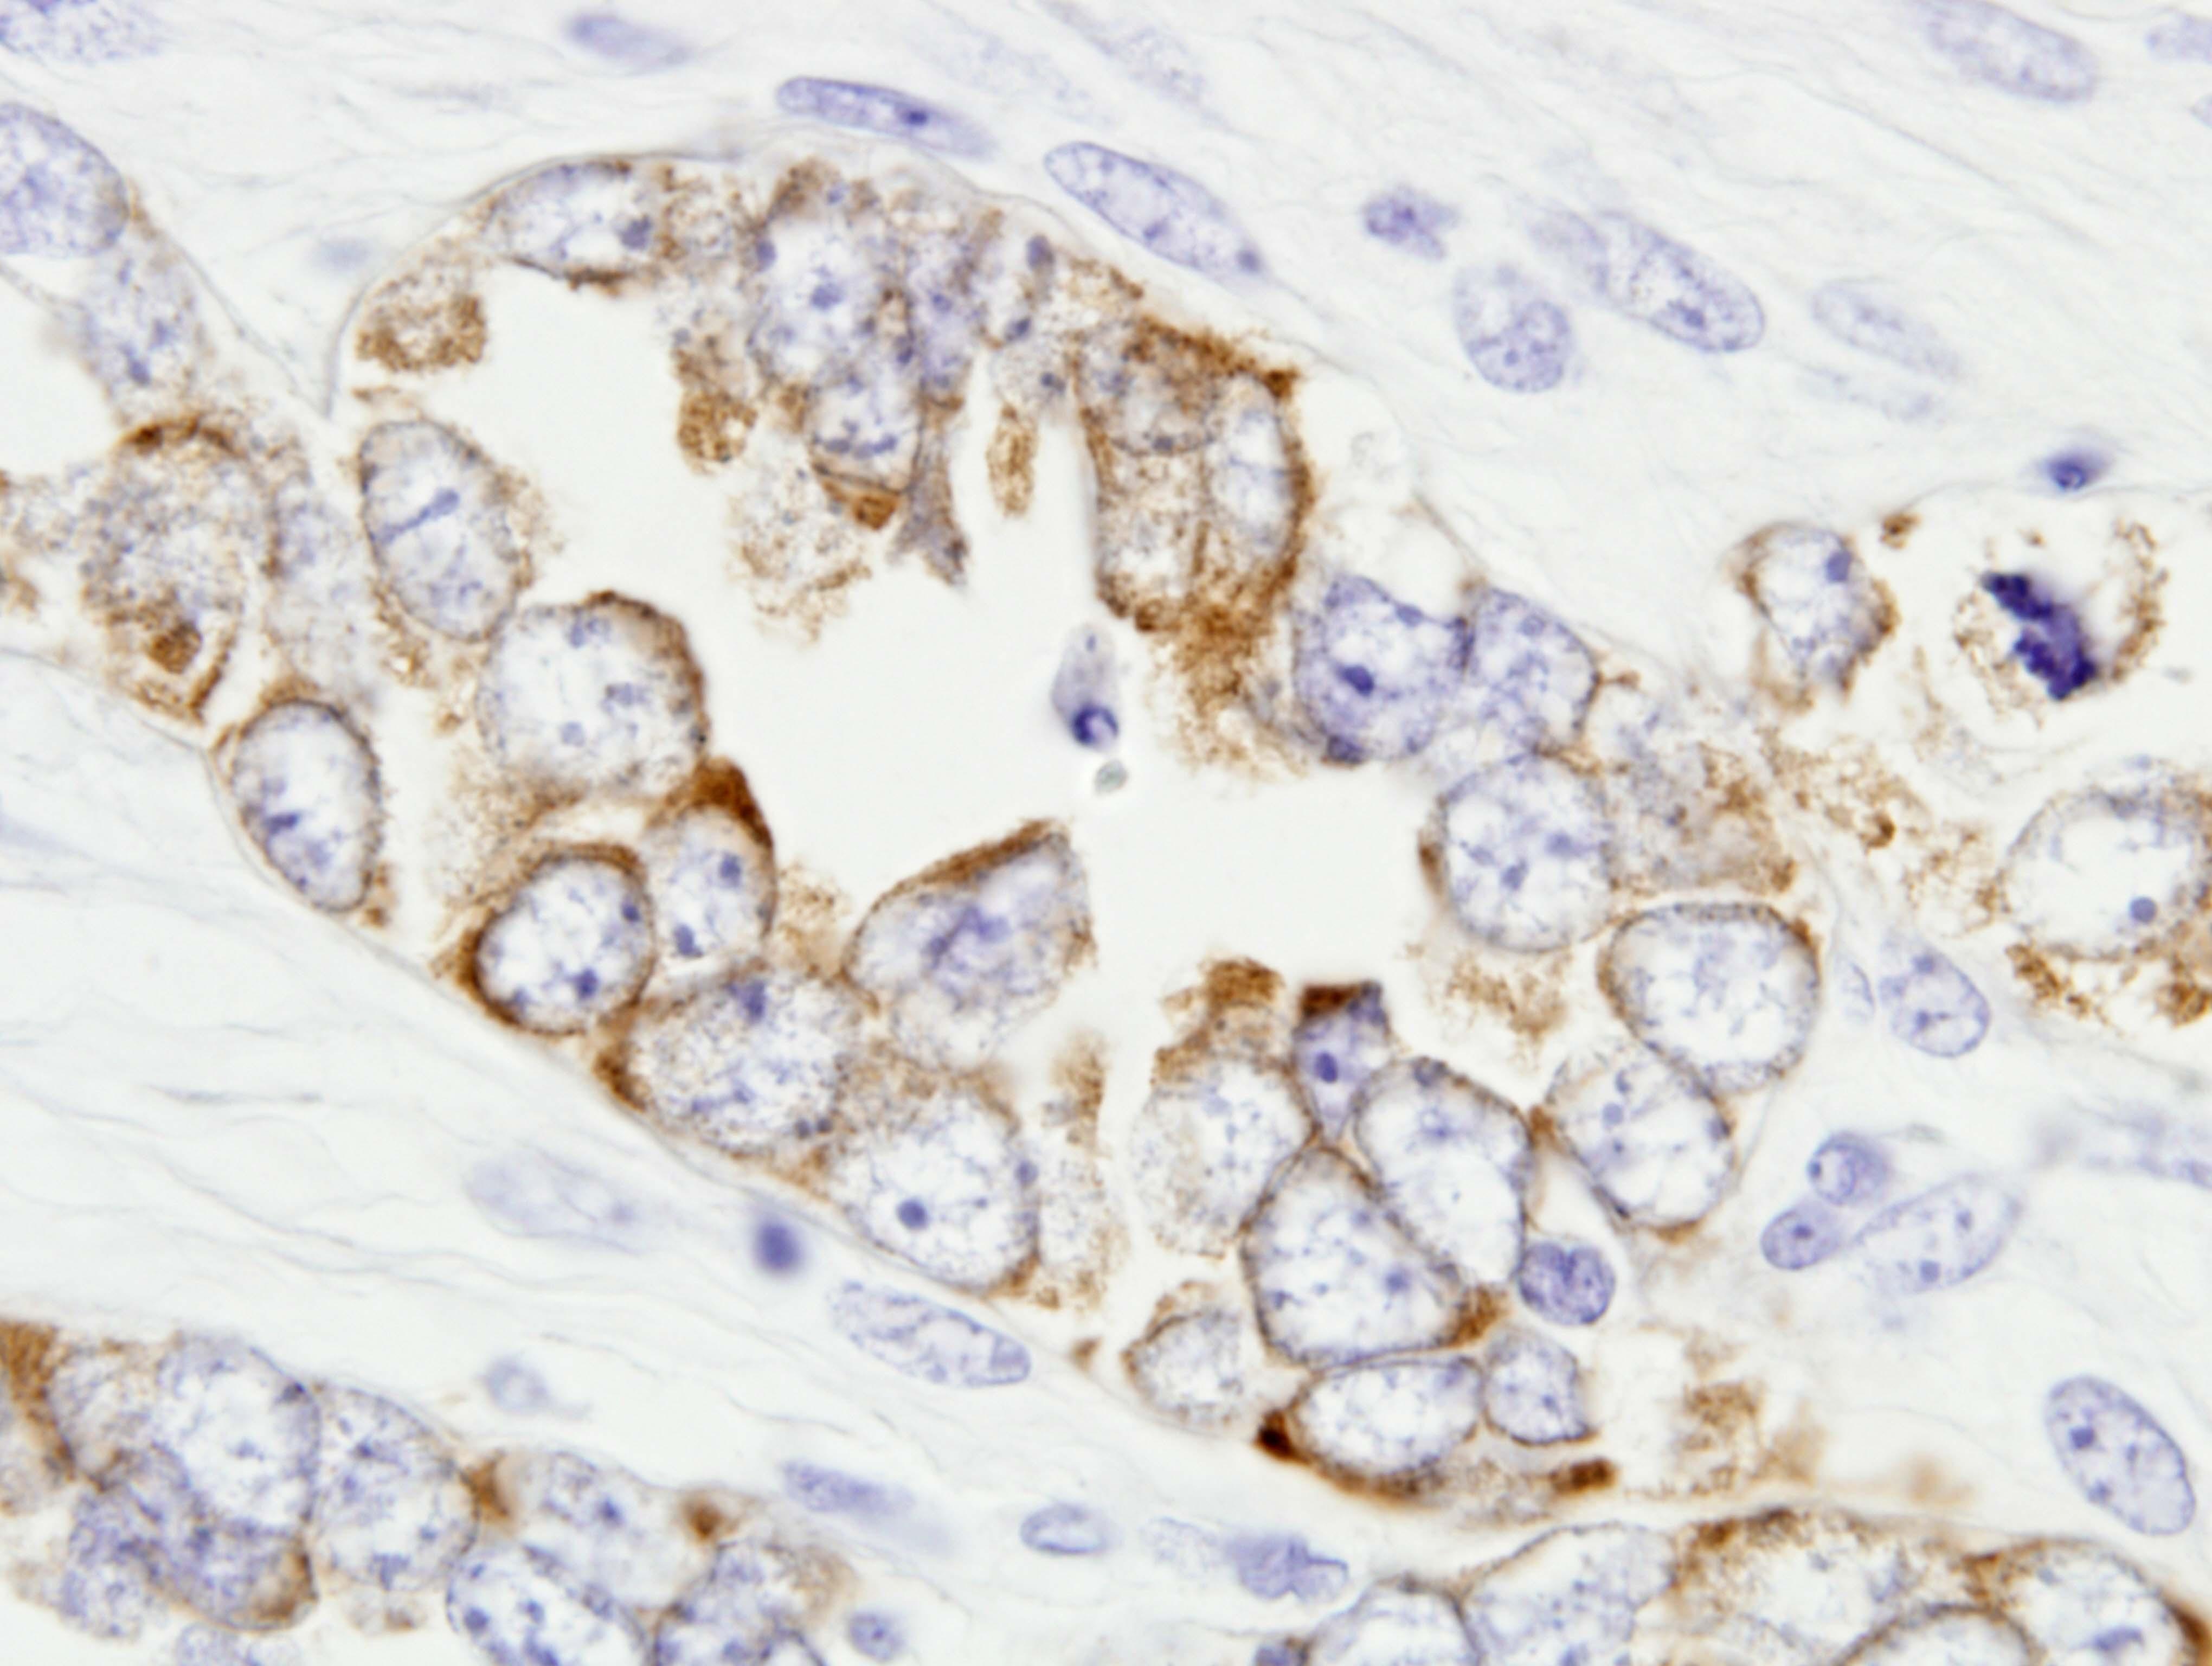 MMP 7 Carcinoma ductal infiltrante de mama, triple negativo, basal, CELL LIKE Las celulas tumorales malignas producen MMP 7